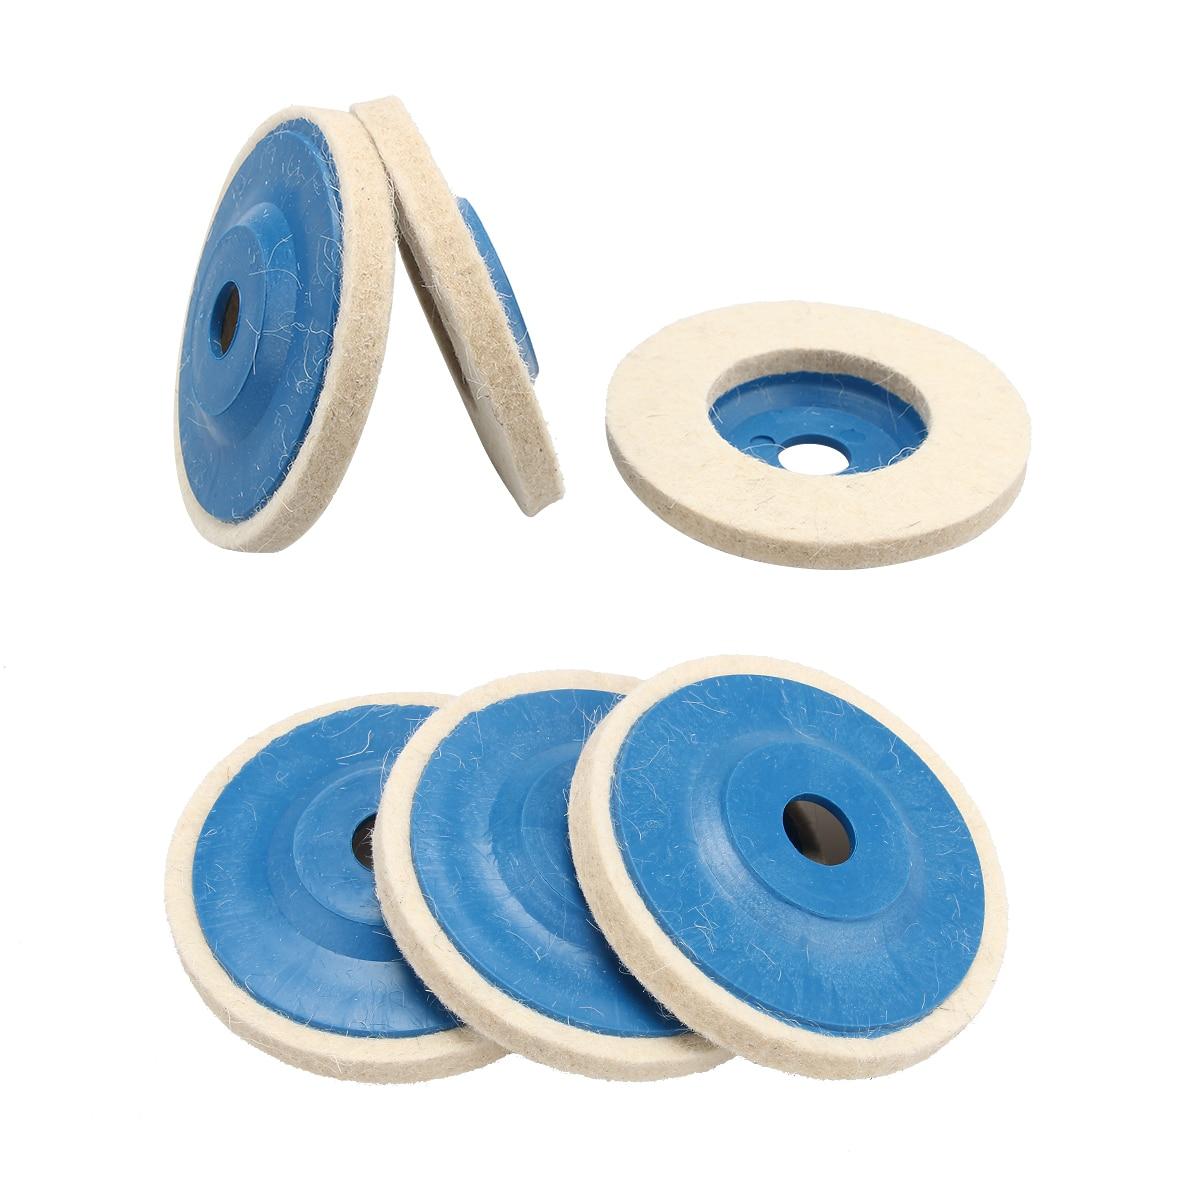 1/3PC 4 Inch Wool Polishing Wheel Buffing Pads 100mm Angle Grinder Wheel Felt Polishing Disc For Metal Marble Glass Ceramics